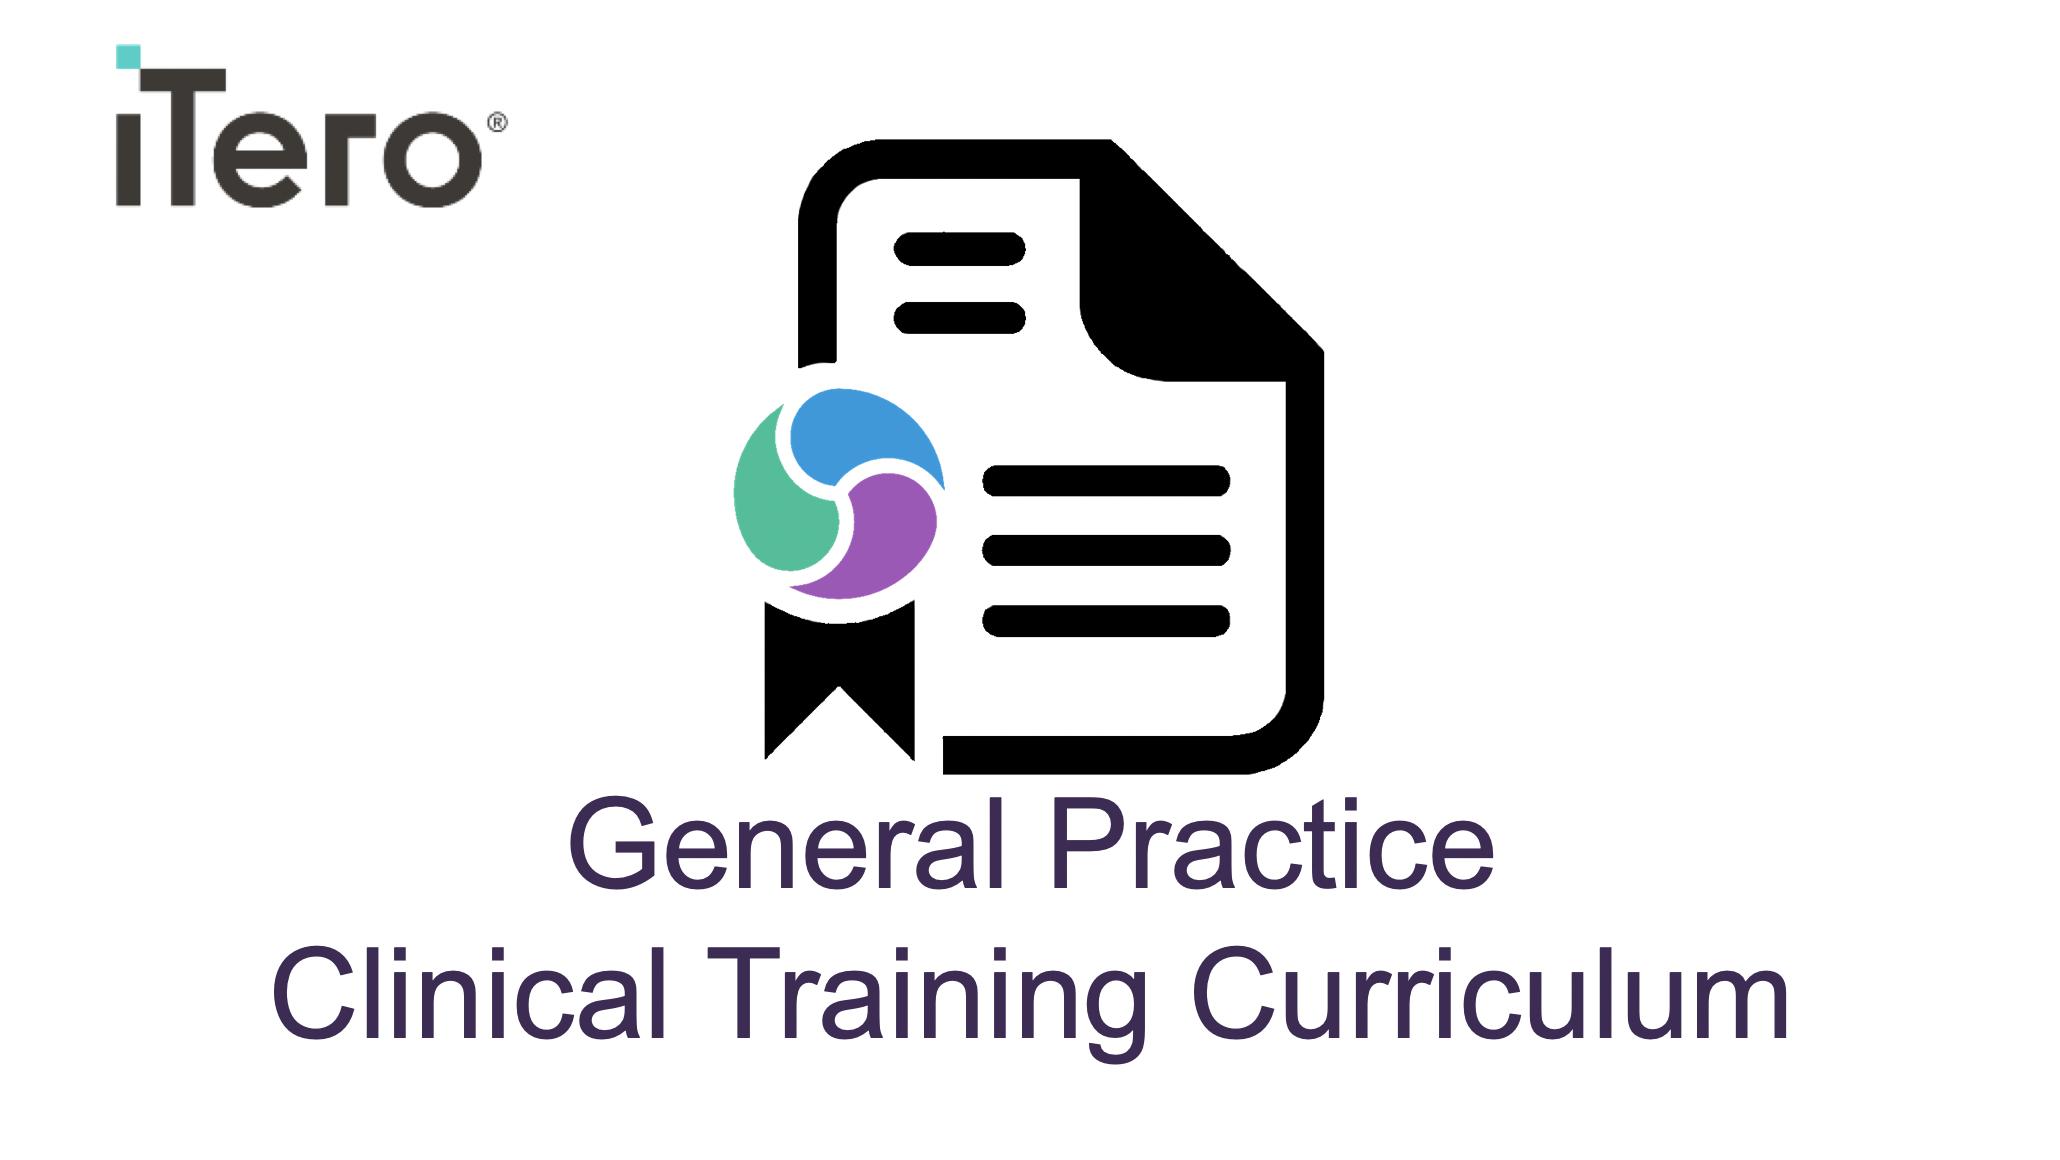 Training Curriculum - New Customer